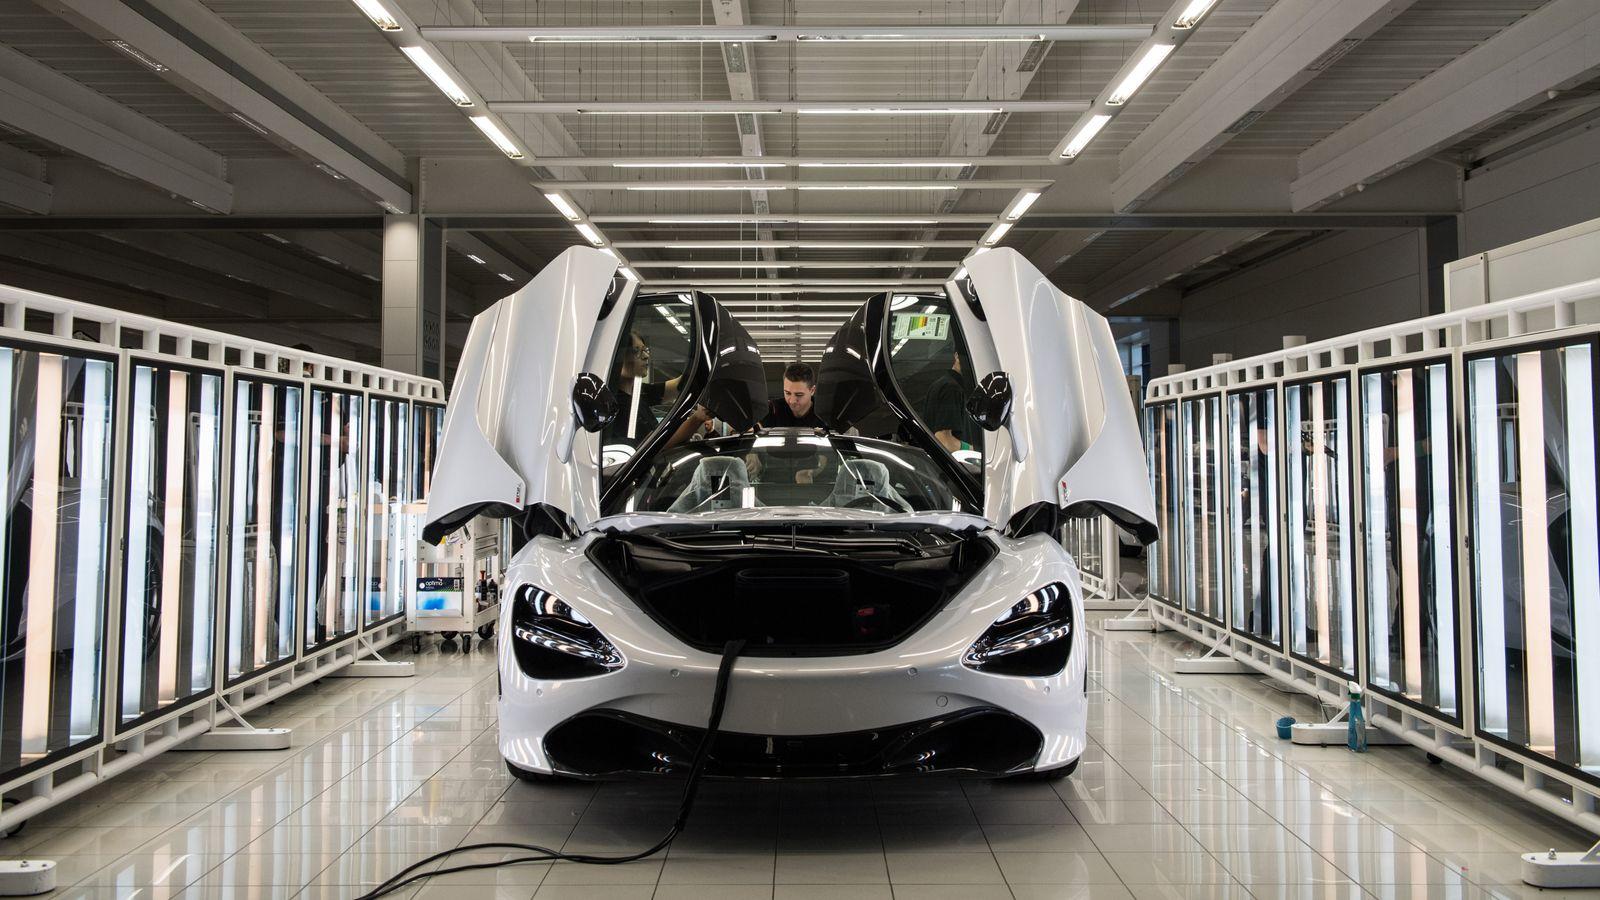 Saudi state fund buys McLaren stake in £550m deal